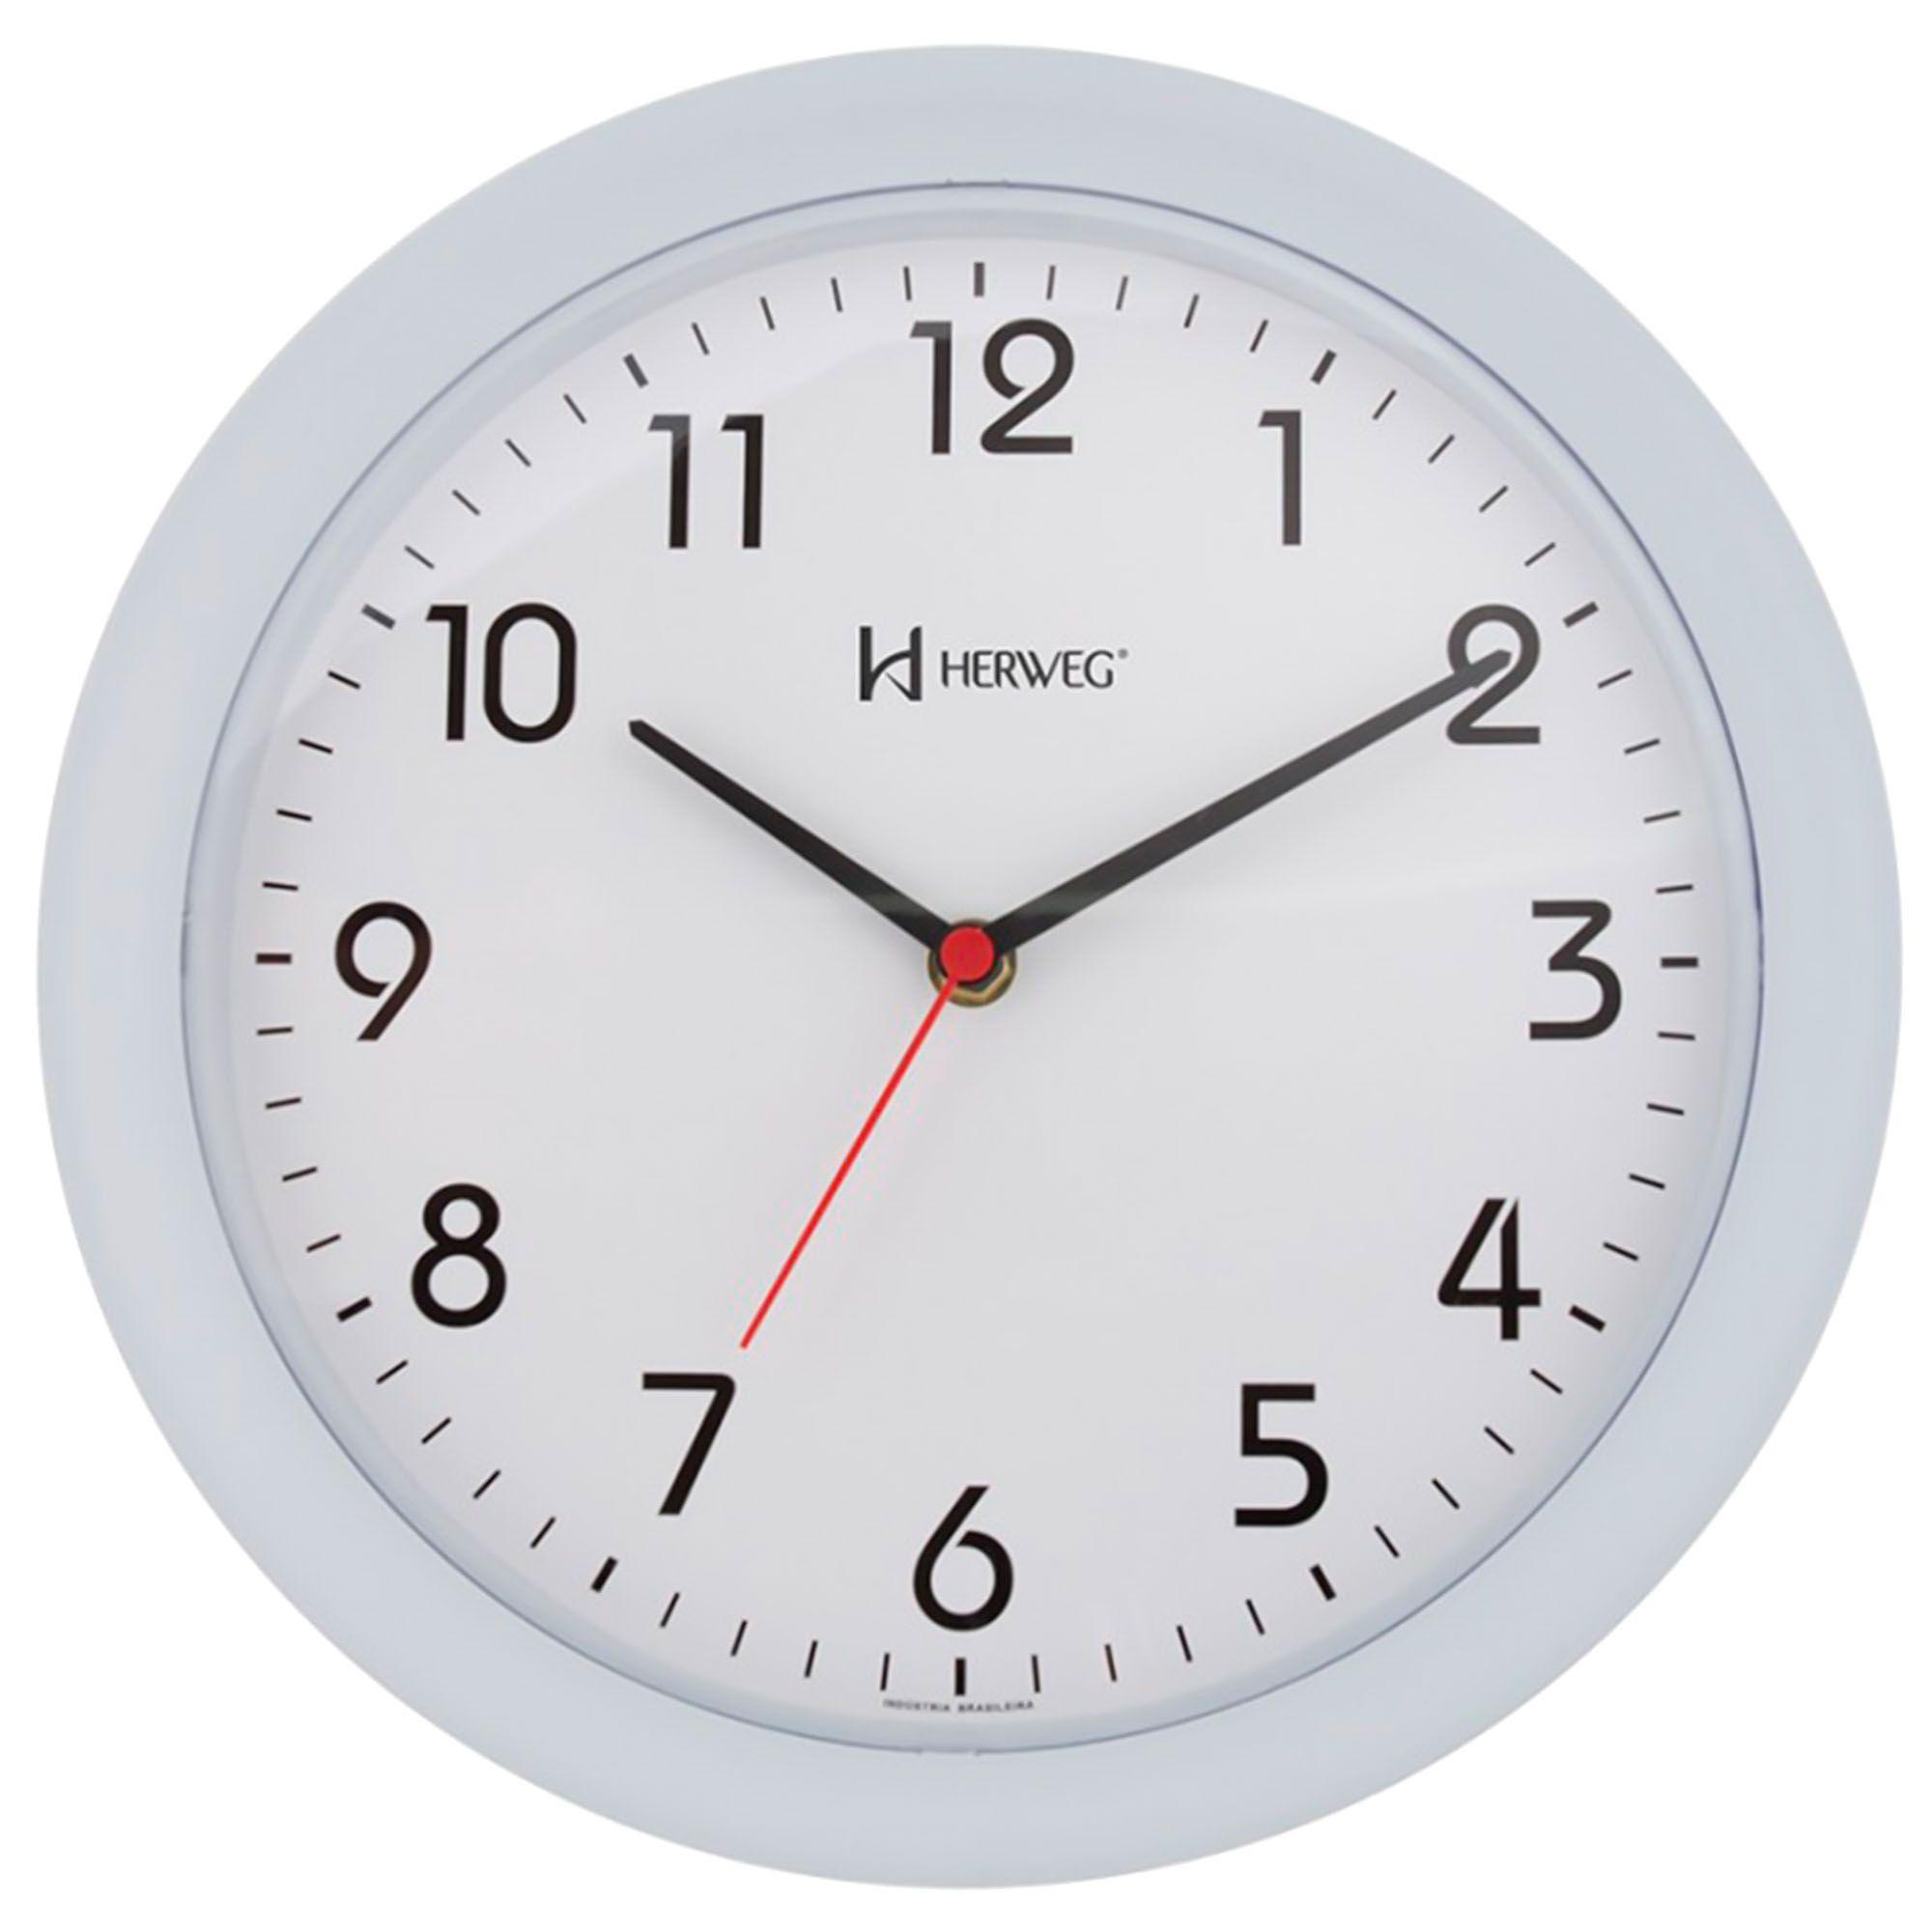 Relógio de Parede Analógico Herweg 6634 132 Branco Fosco